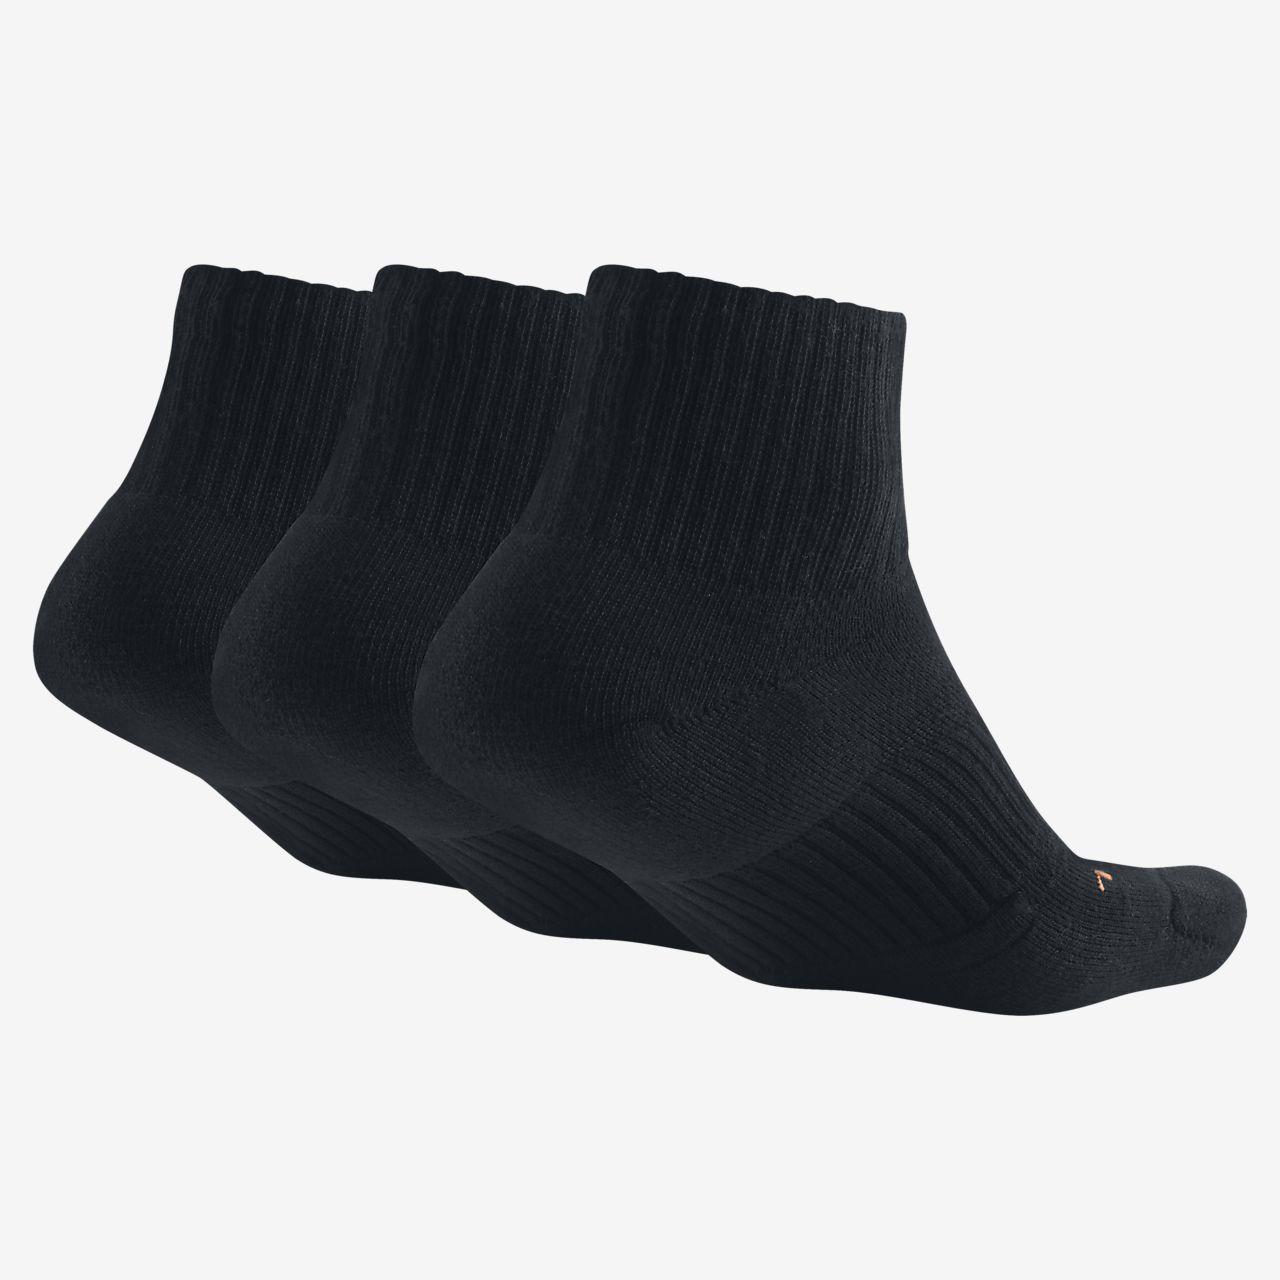 Nike Mens Dri-fit Calcetines Escotados 3 Pares